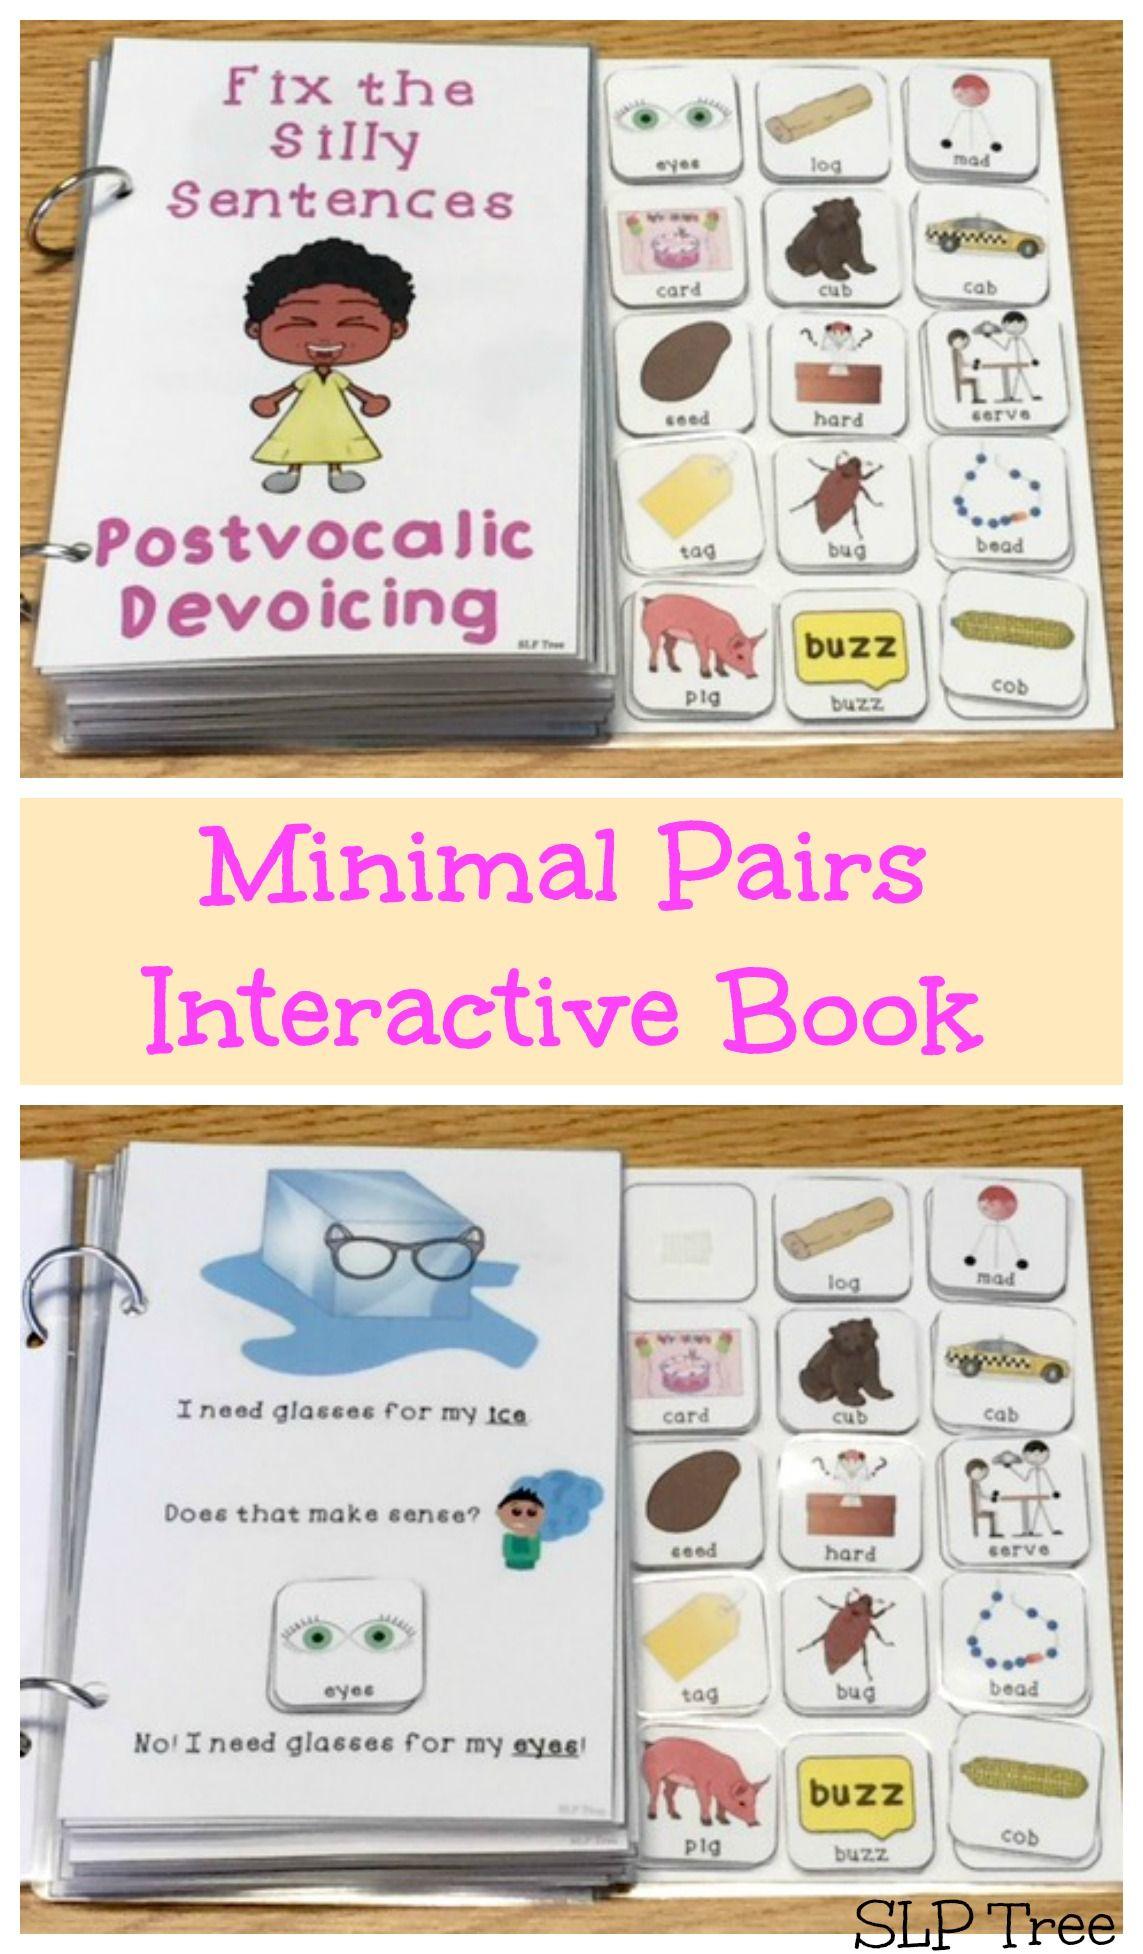 Minimal Pairs Interactive Book Postvocalic Devoicing